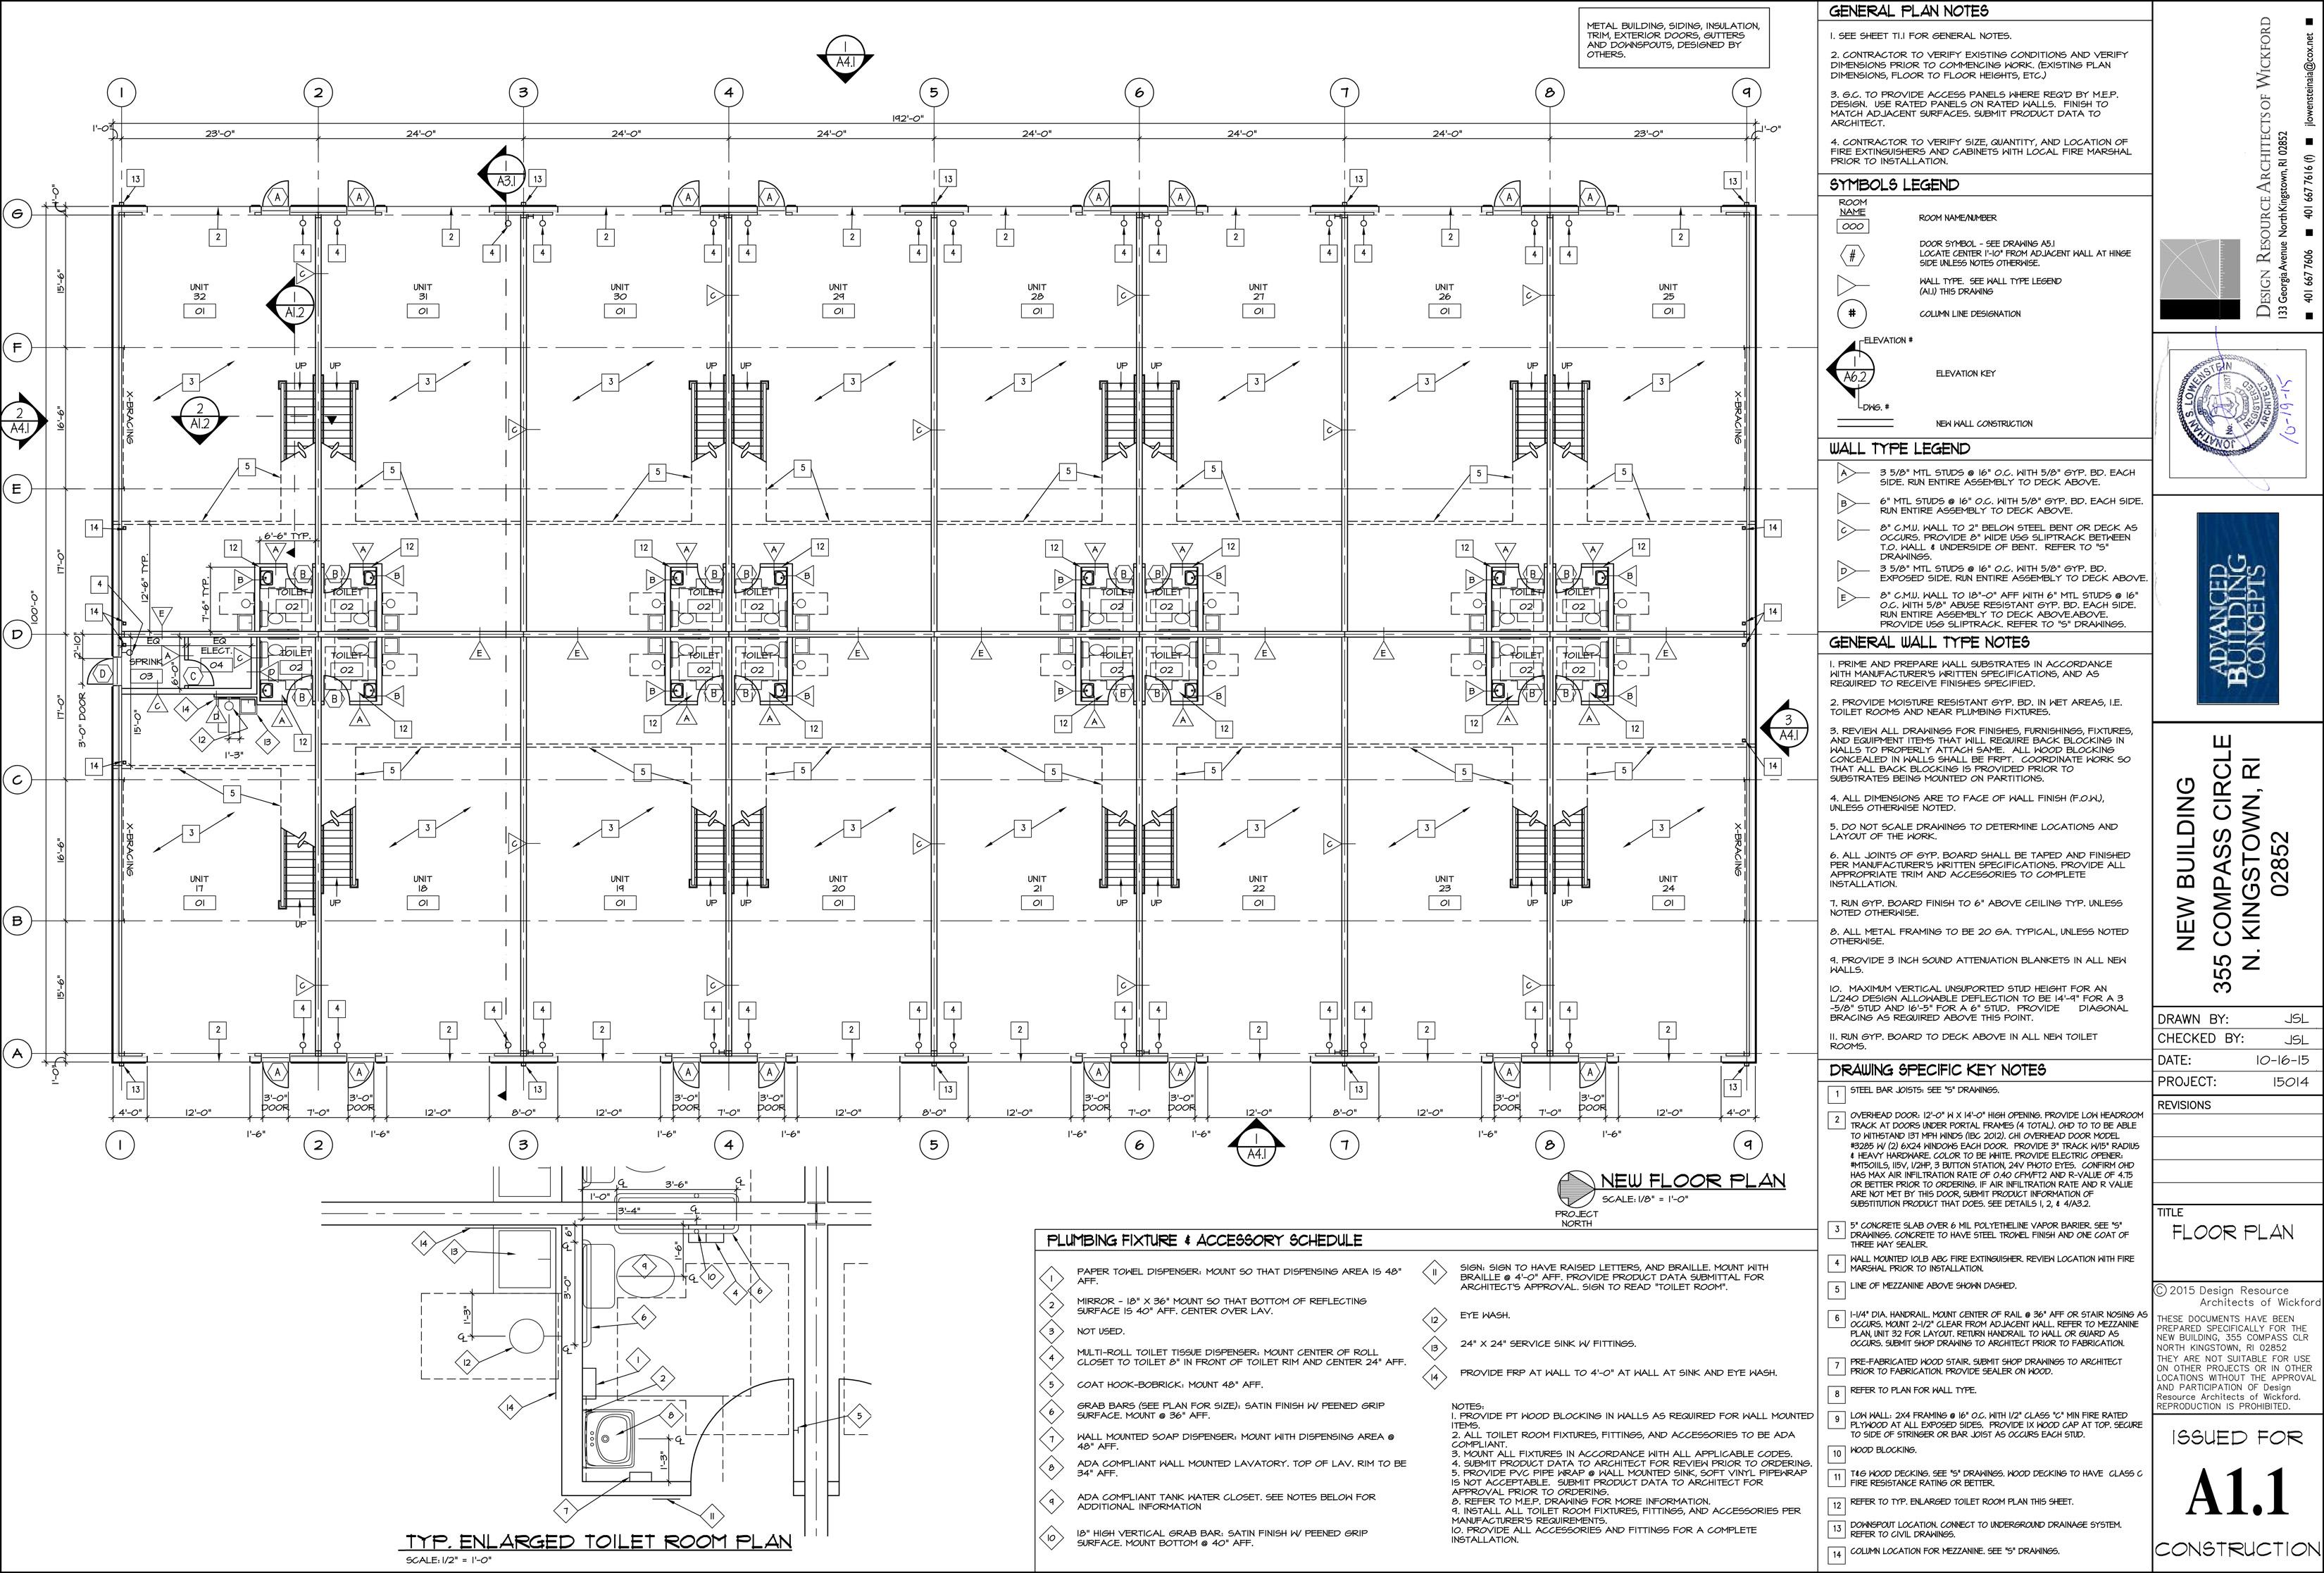 C:UsersArchitectdrawingsD-Res-Projects20151501415014-PLN